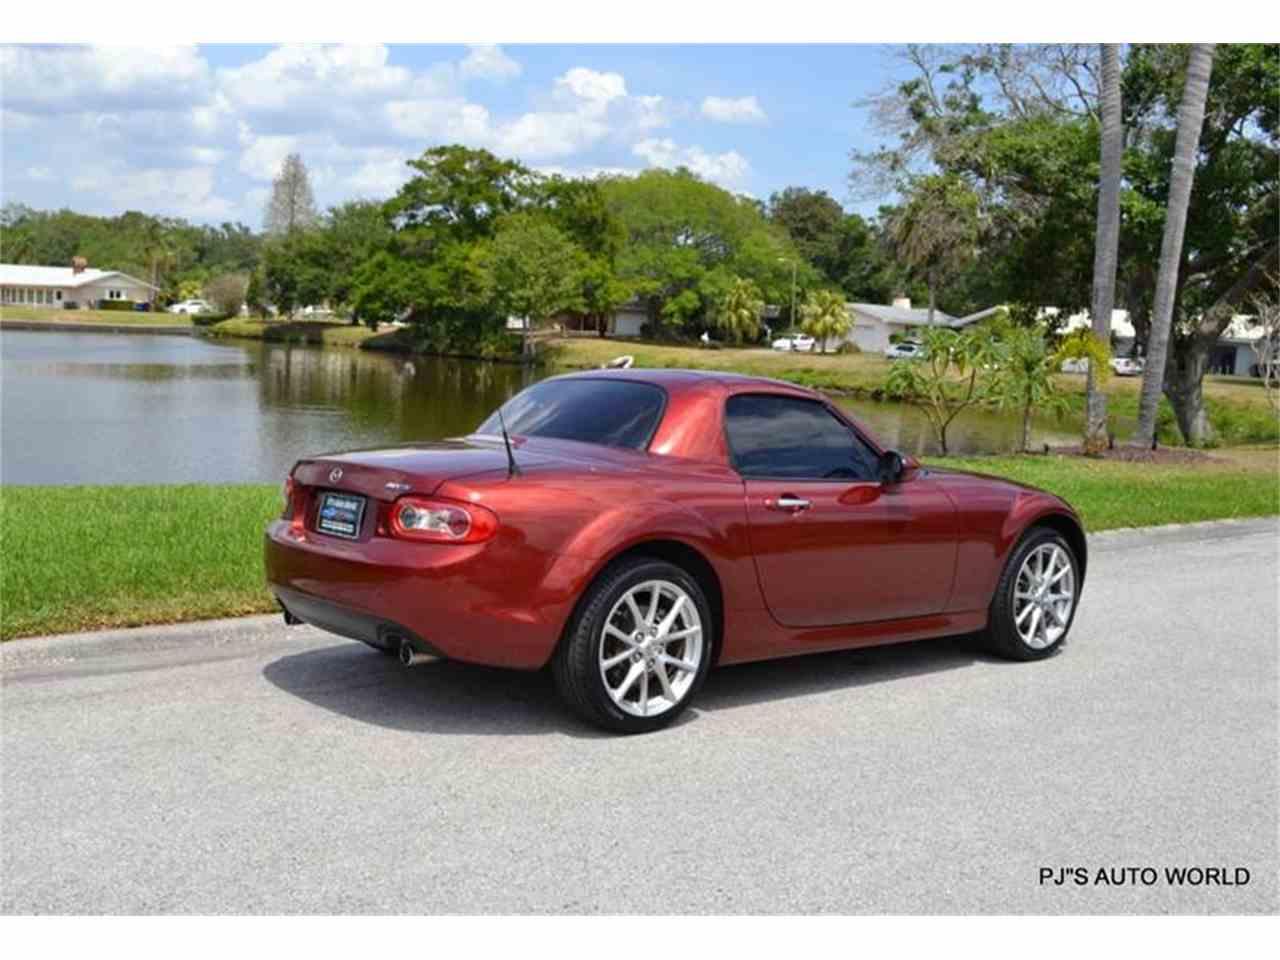 Large Picture of 2012 Mazda Miata located in Florida - $16,600.00 - L6IJ